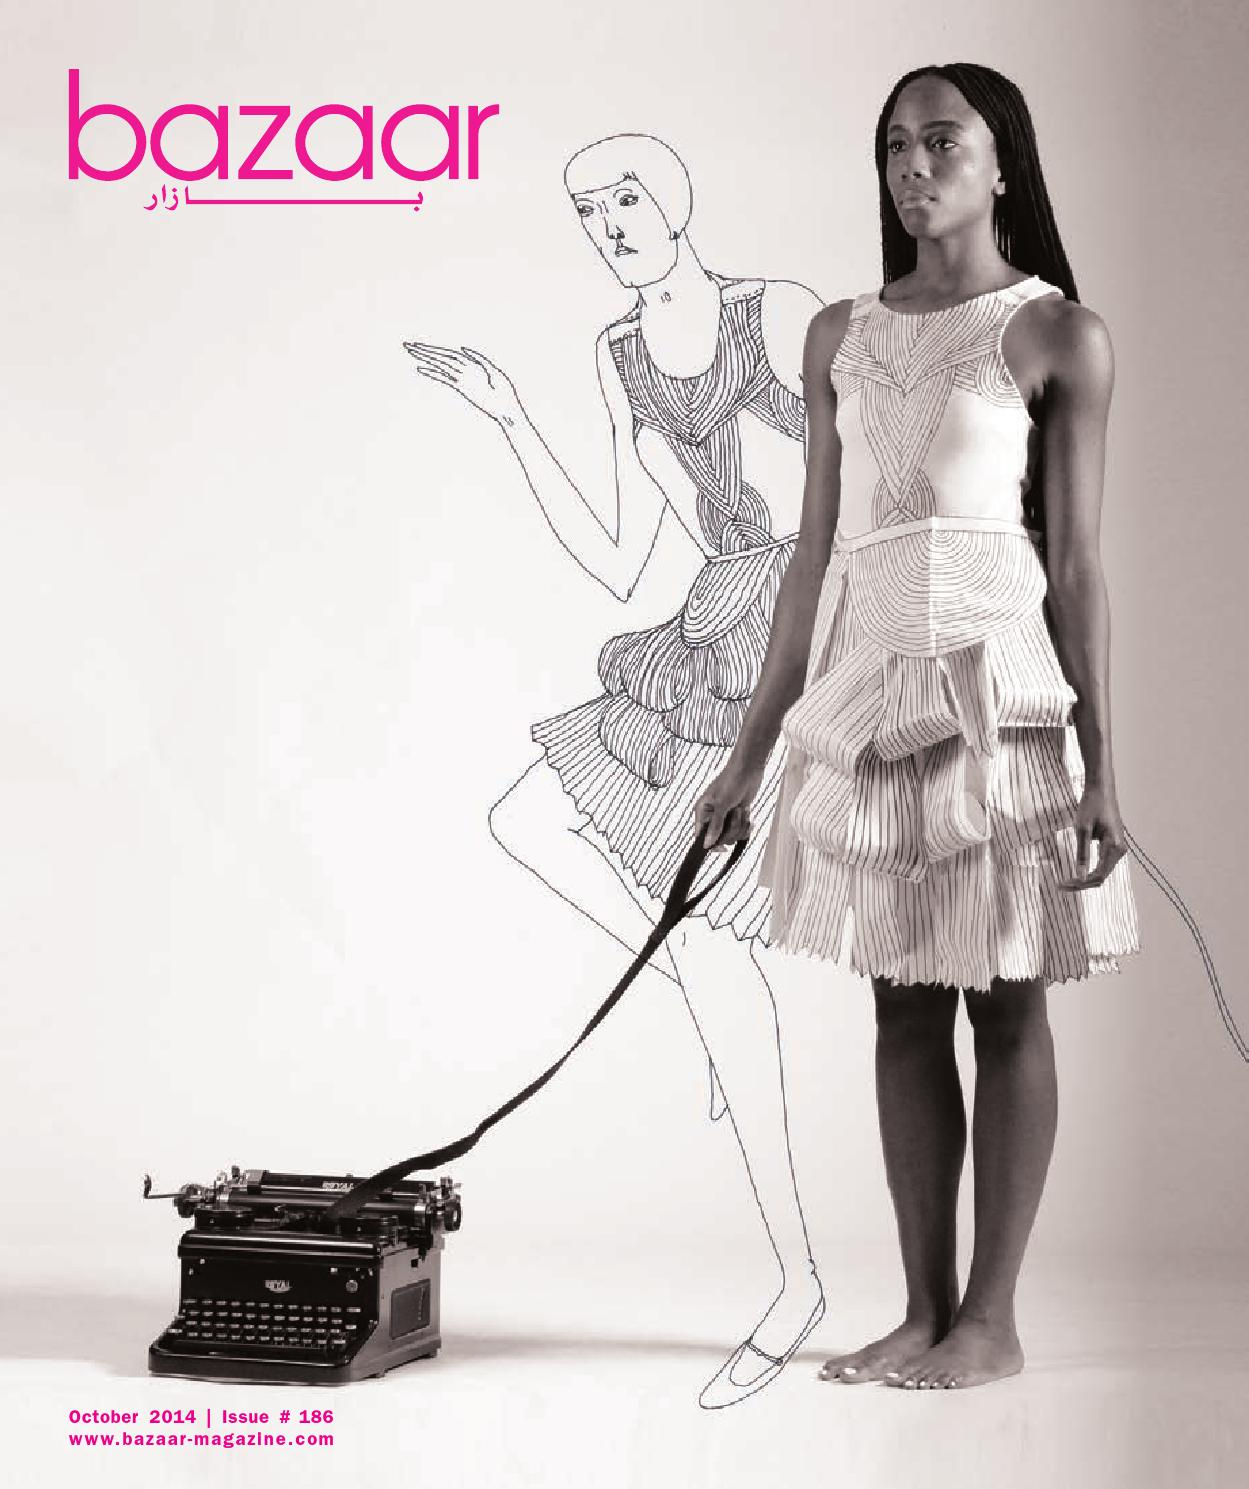 BAZAAR Editors Test Drive J Brands New Utility Essentials BAZAAR Editors Test Drive J Brands New Utility Essentials new pictures